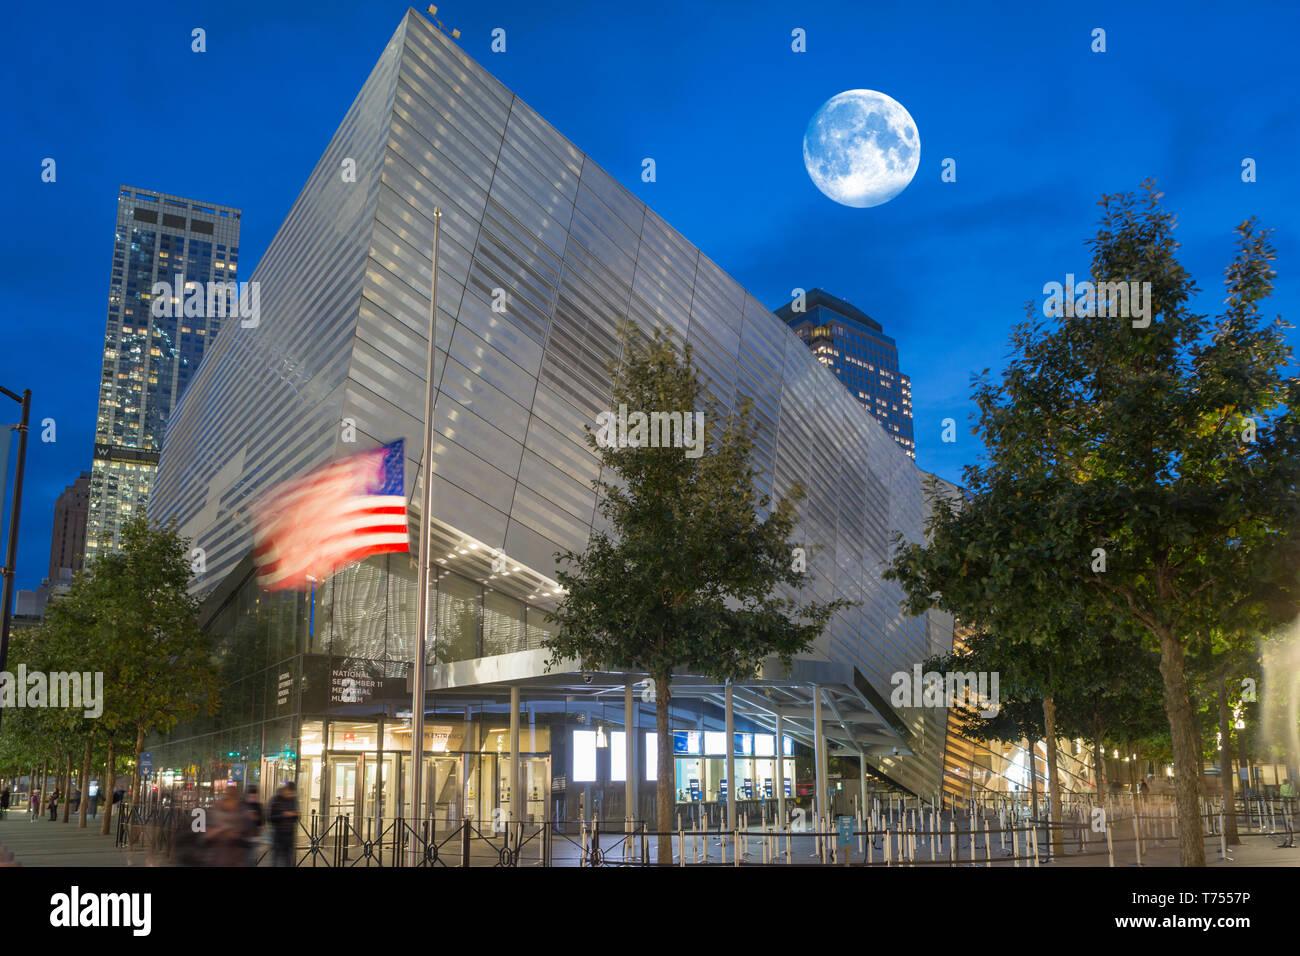 ENTRANCE PAVILION NATIONAL SEPTEMBER 11 MEMORIAL MUSEUM (©DAVIS BRODY BOND 2018 ) DOWNTOWN MANHATTAN NEW YORK CITY USA - Stock Image